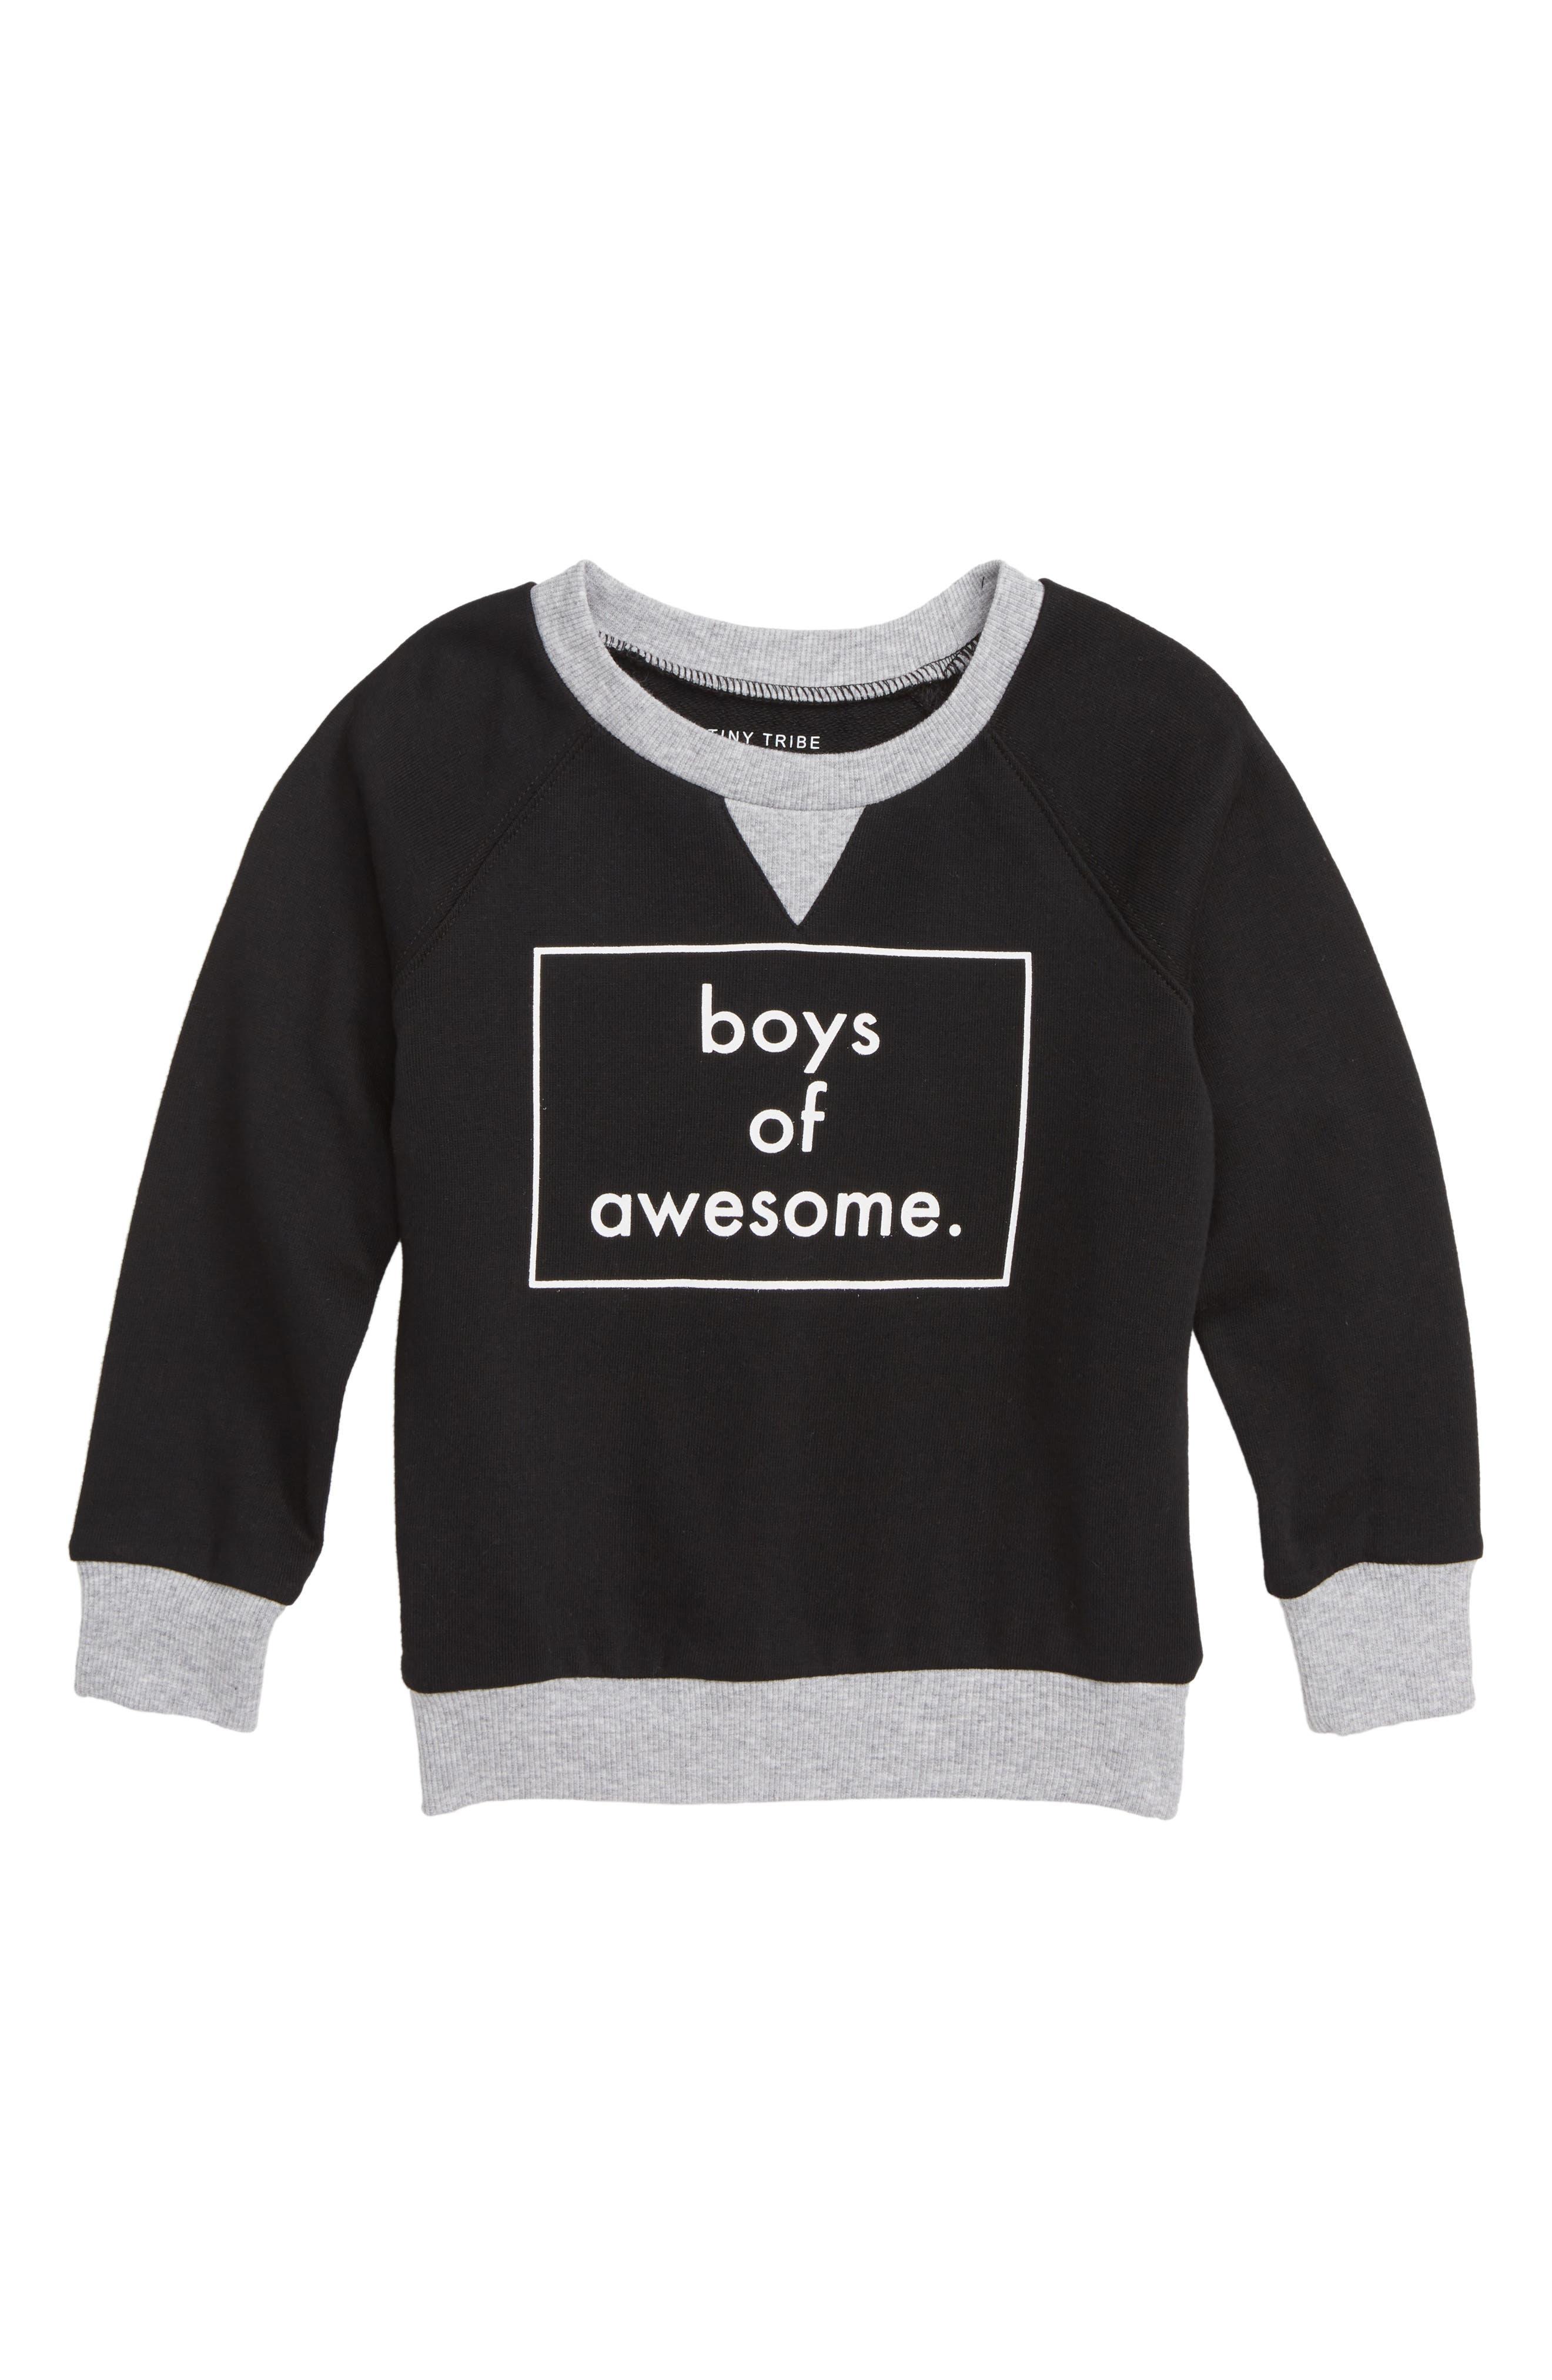 Boys of Awesome Sweatshirt,                             Main thumbnail 1, color,                             001